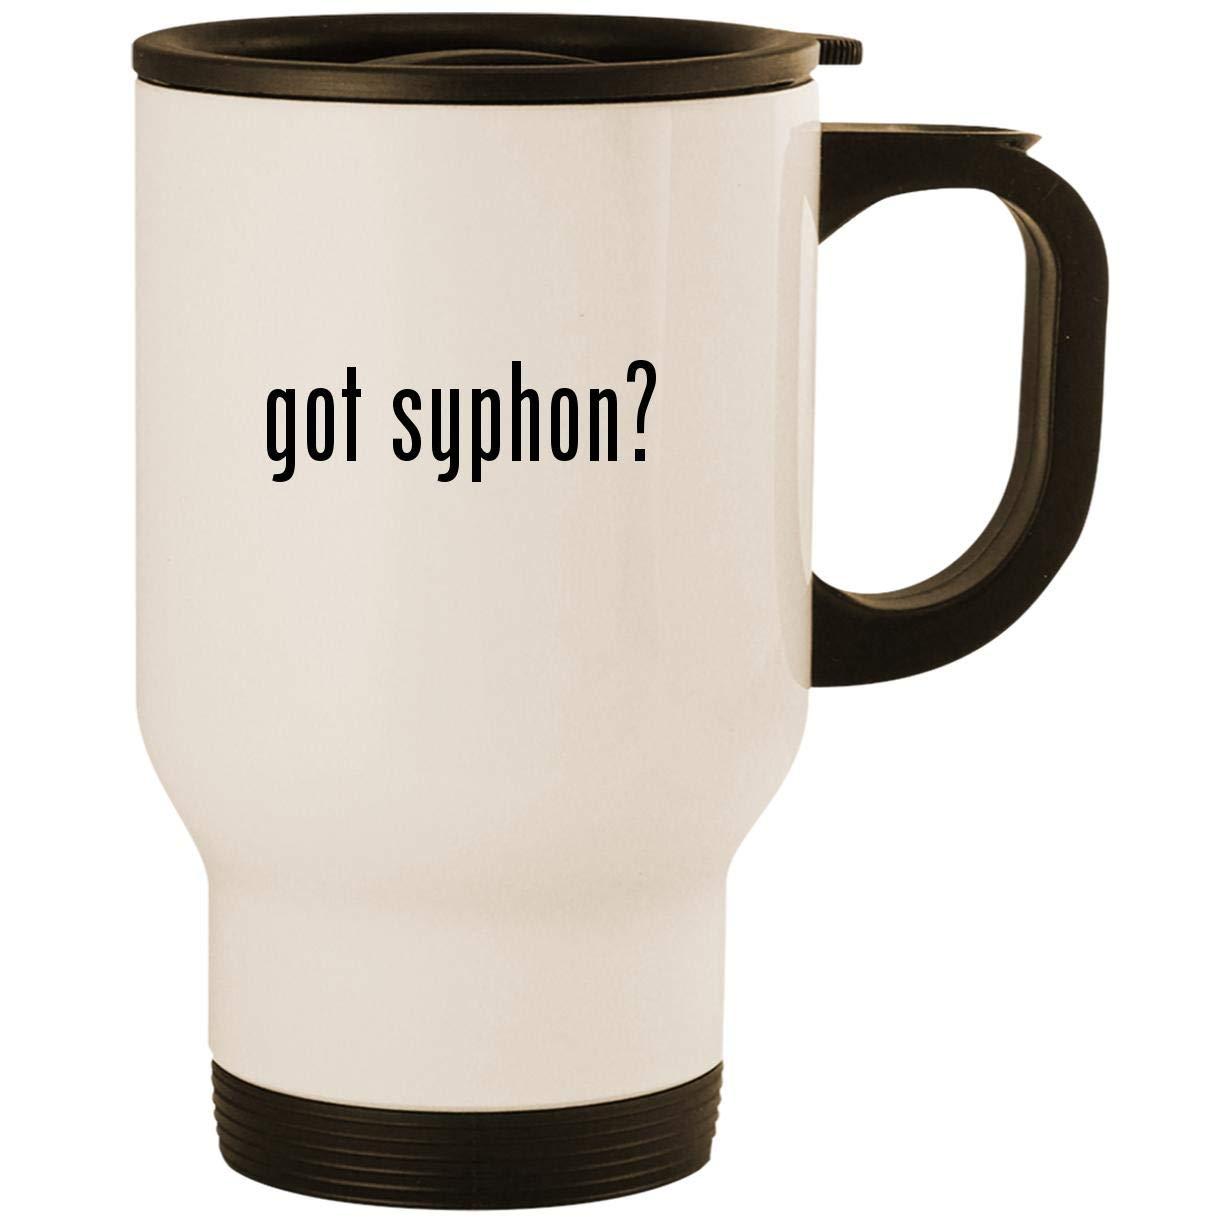 got syphon? - Stainless Steel 14oz Road Ready Travel Mug, White